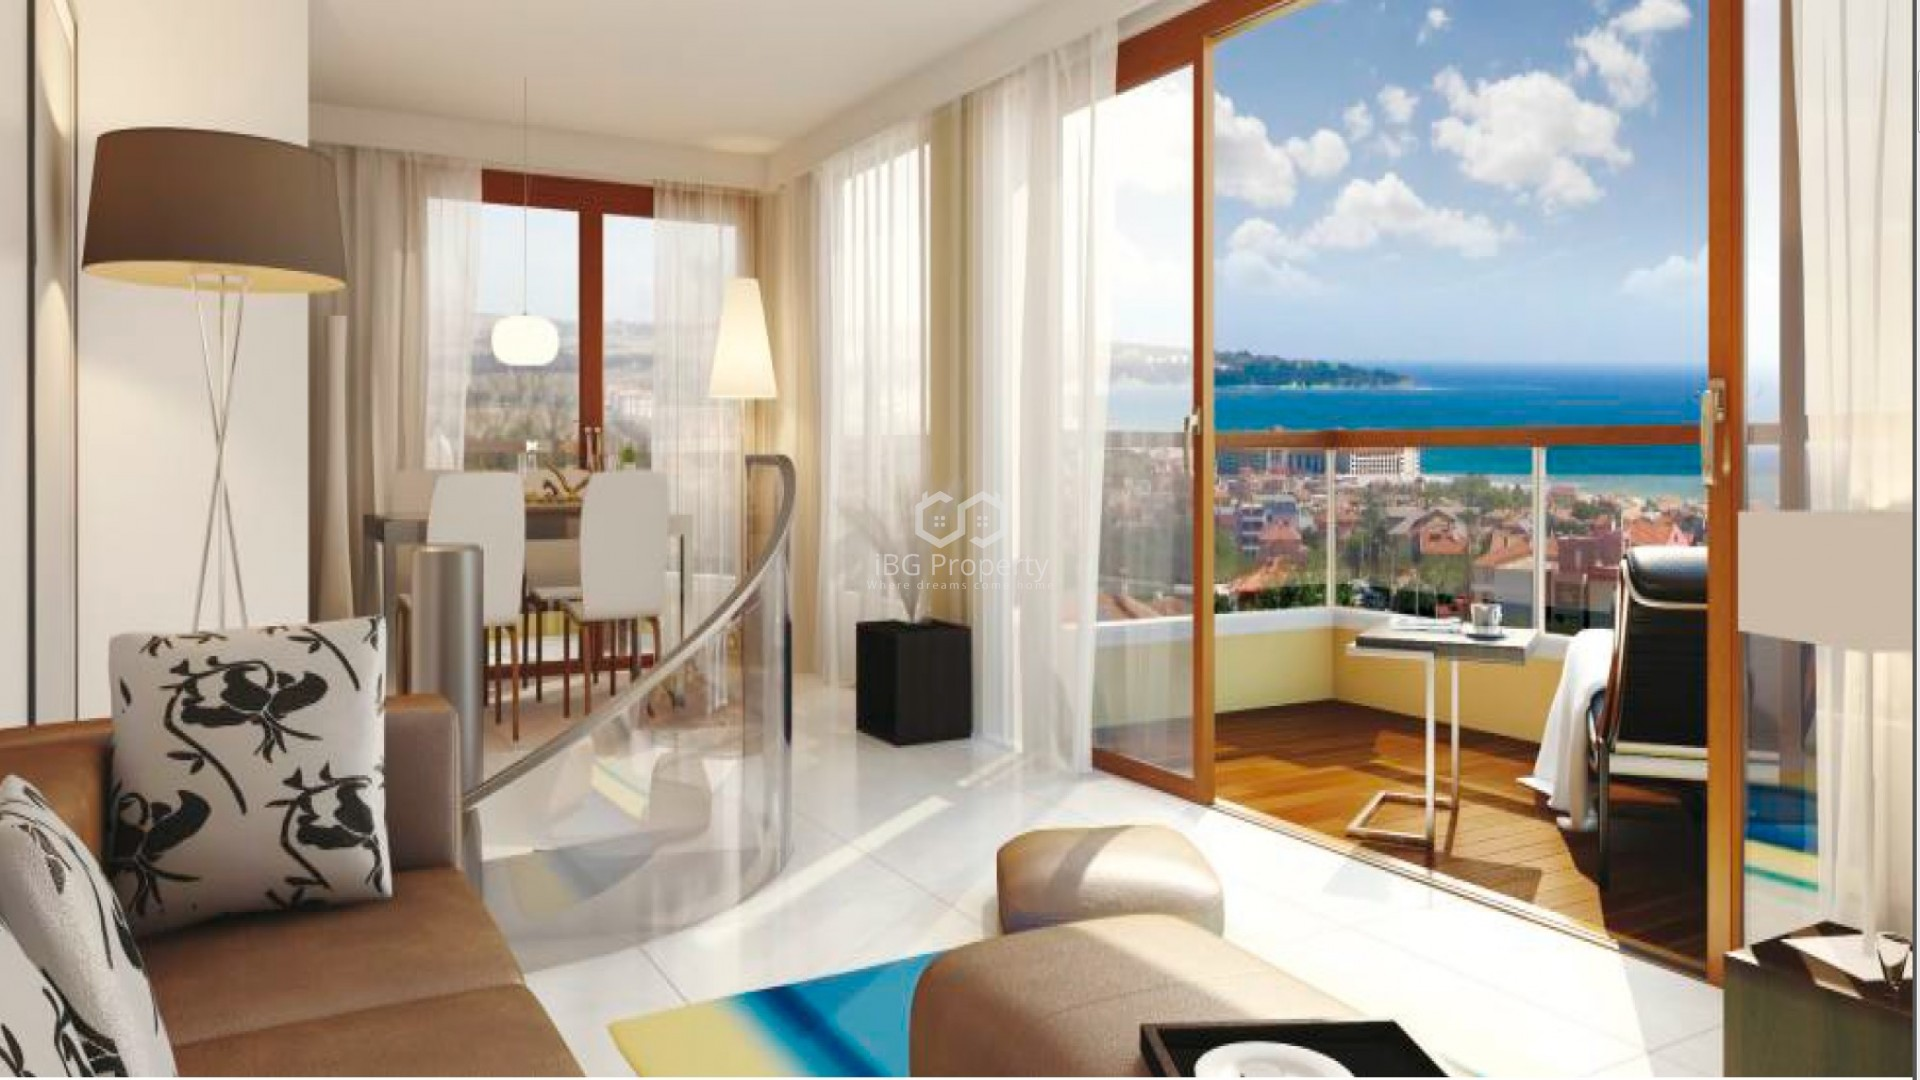 Двустаен апартамент Обзор 103 m2